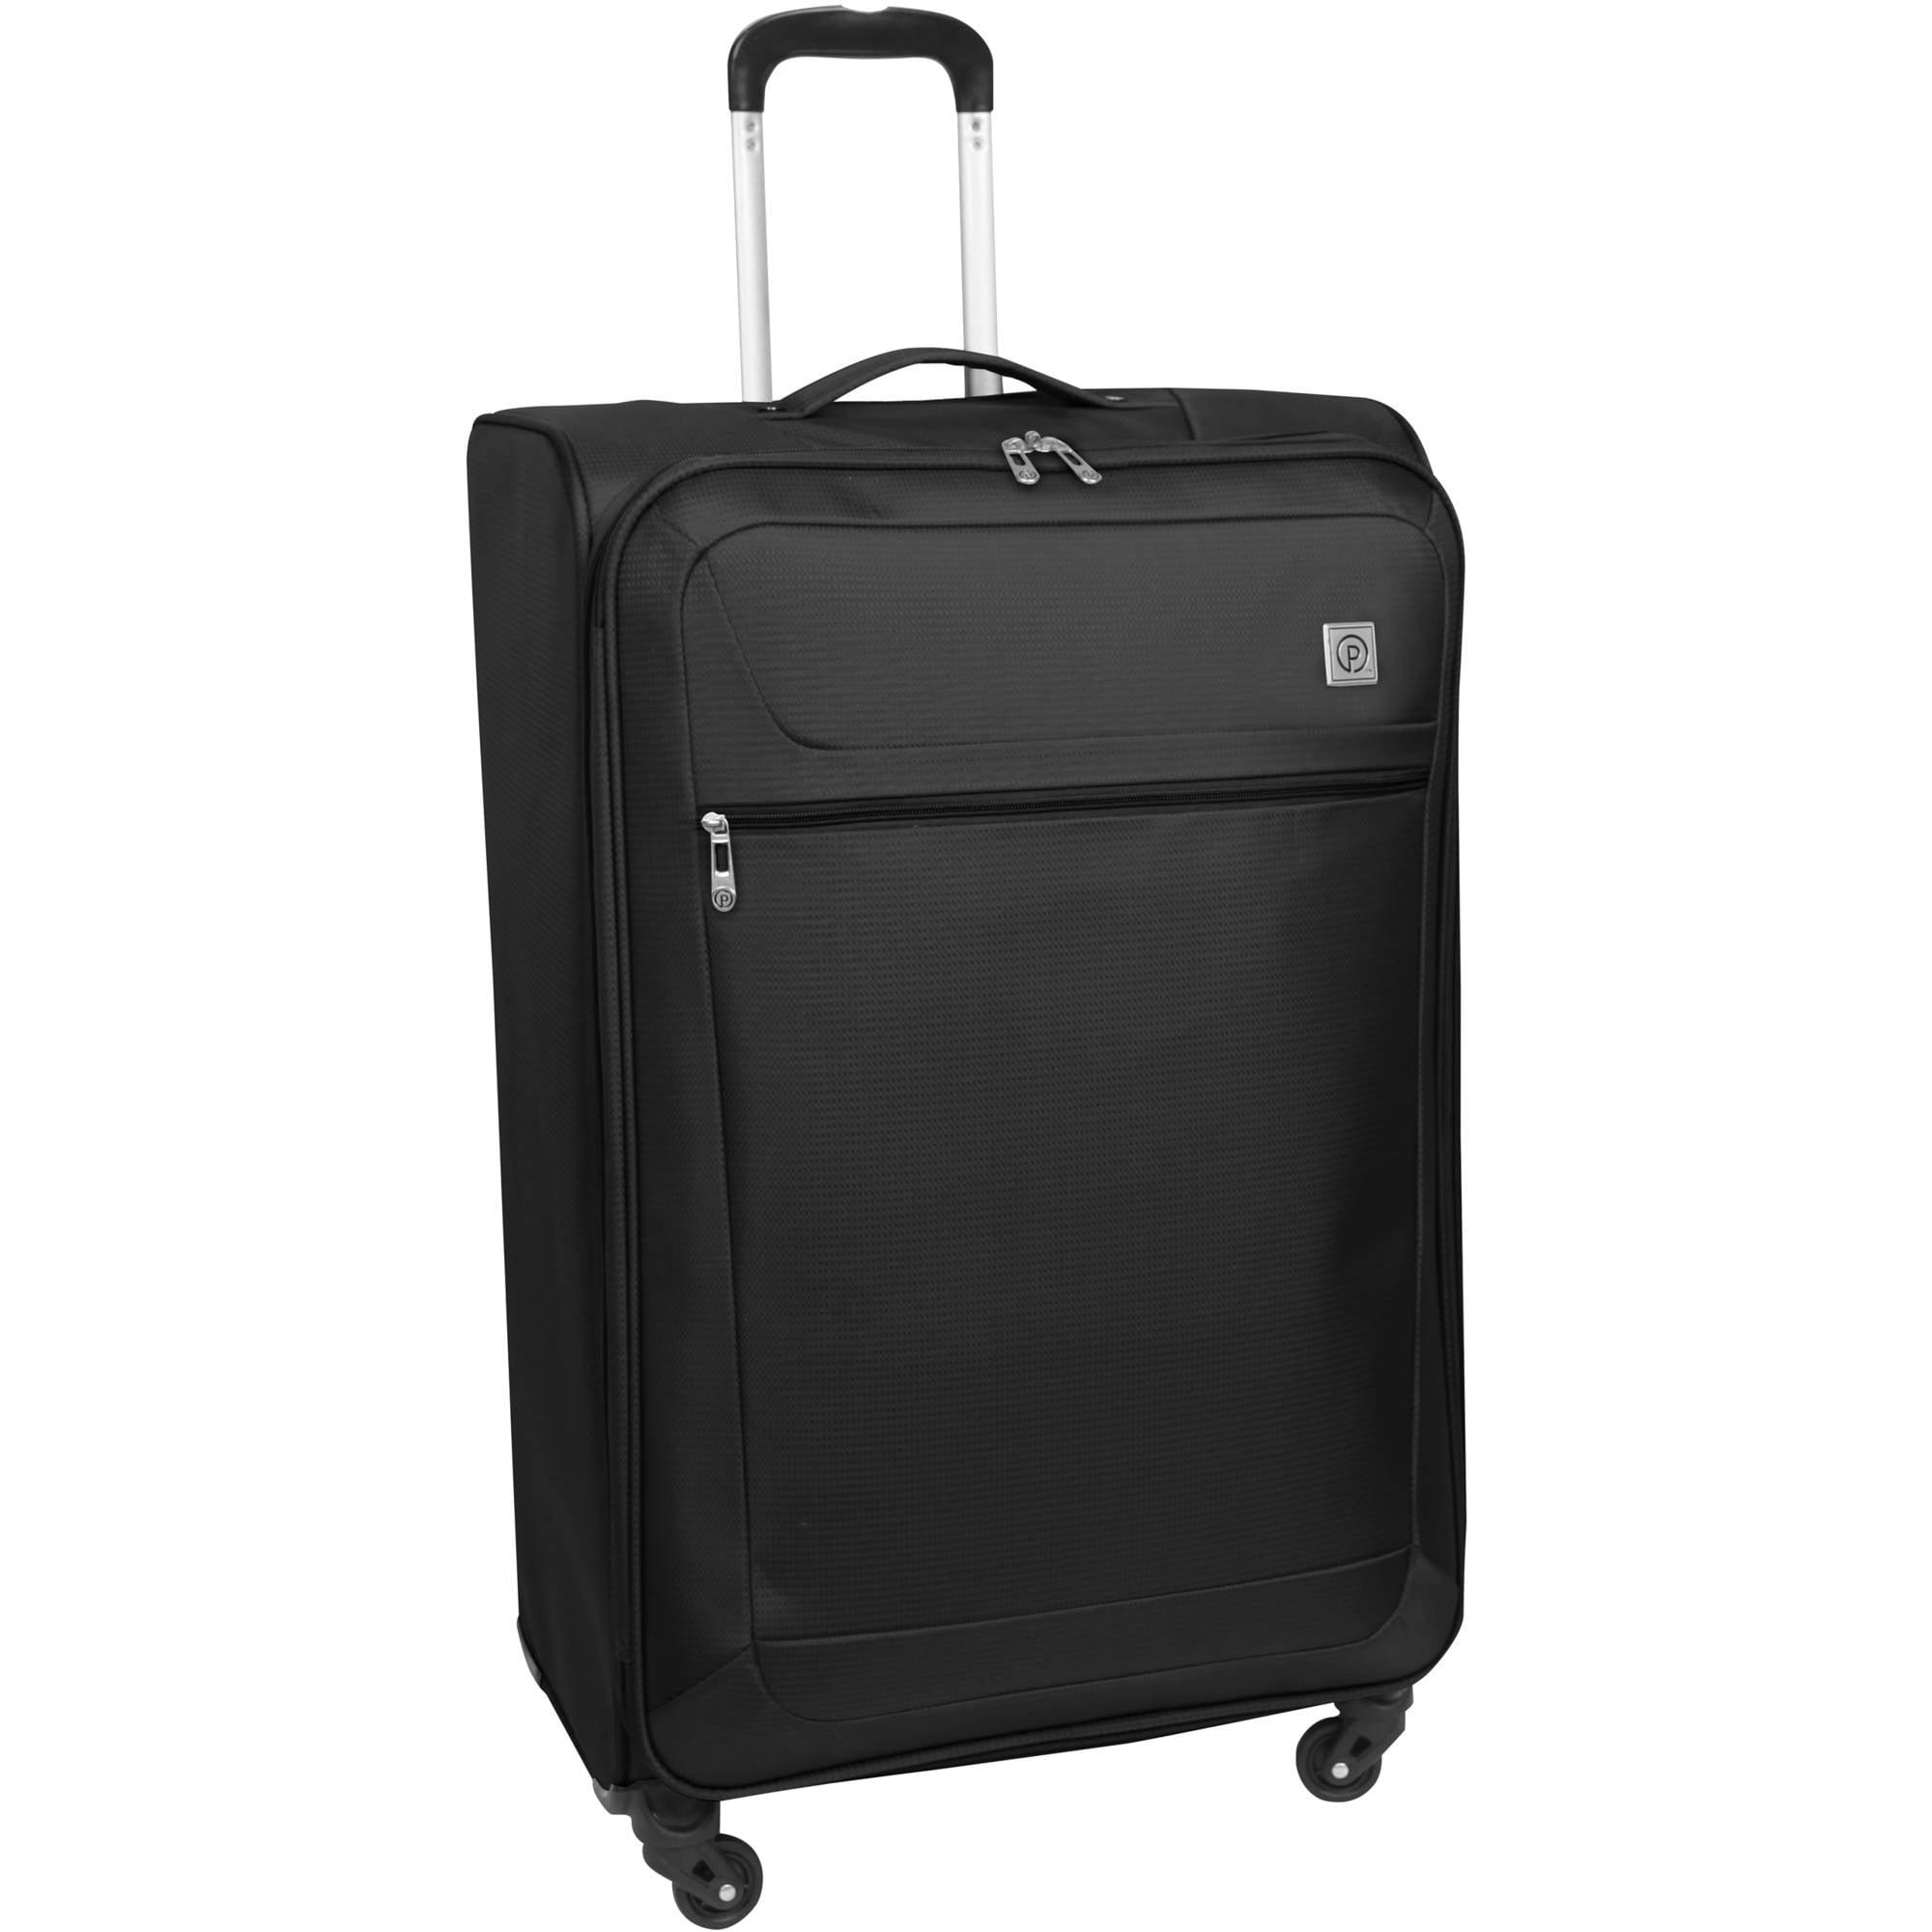 PROTEGE Vapor Lightweight Luggage, Black - Walmart.com